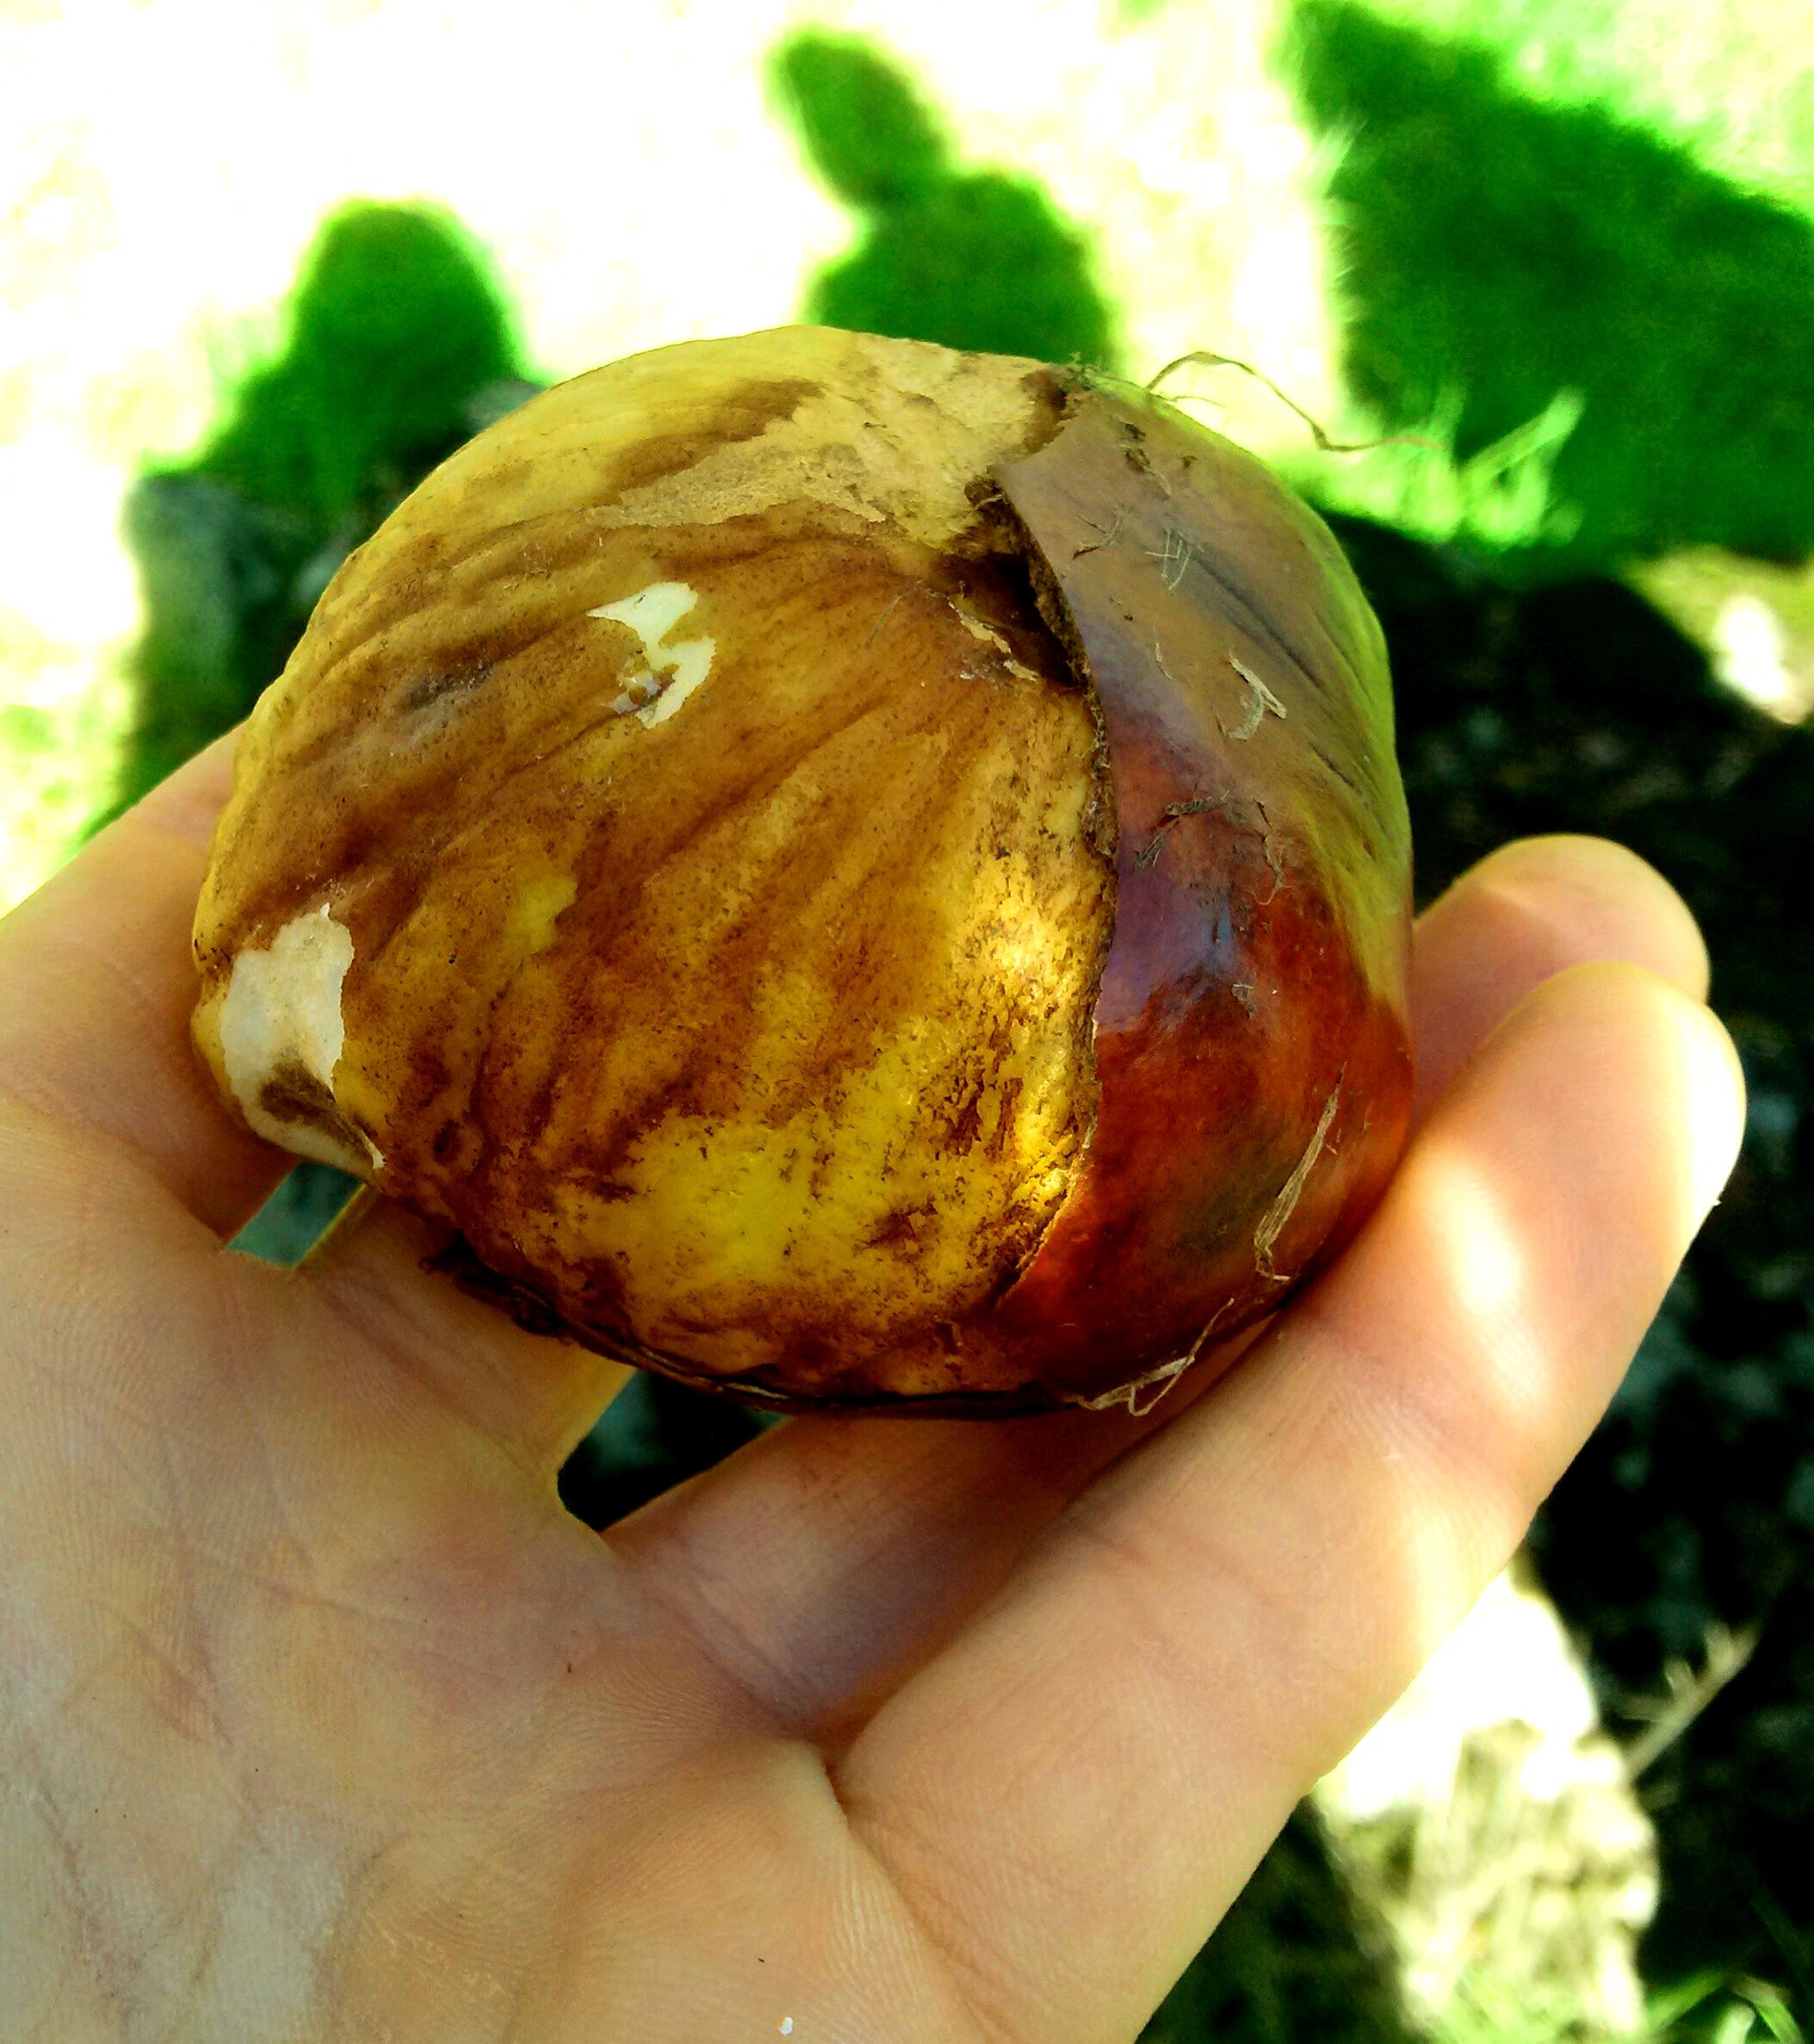 California Buckeye large abundant nut food source -1 (1)